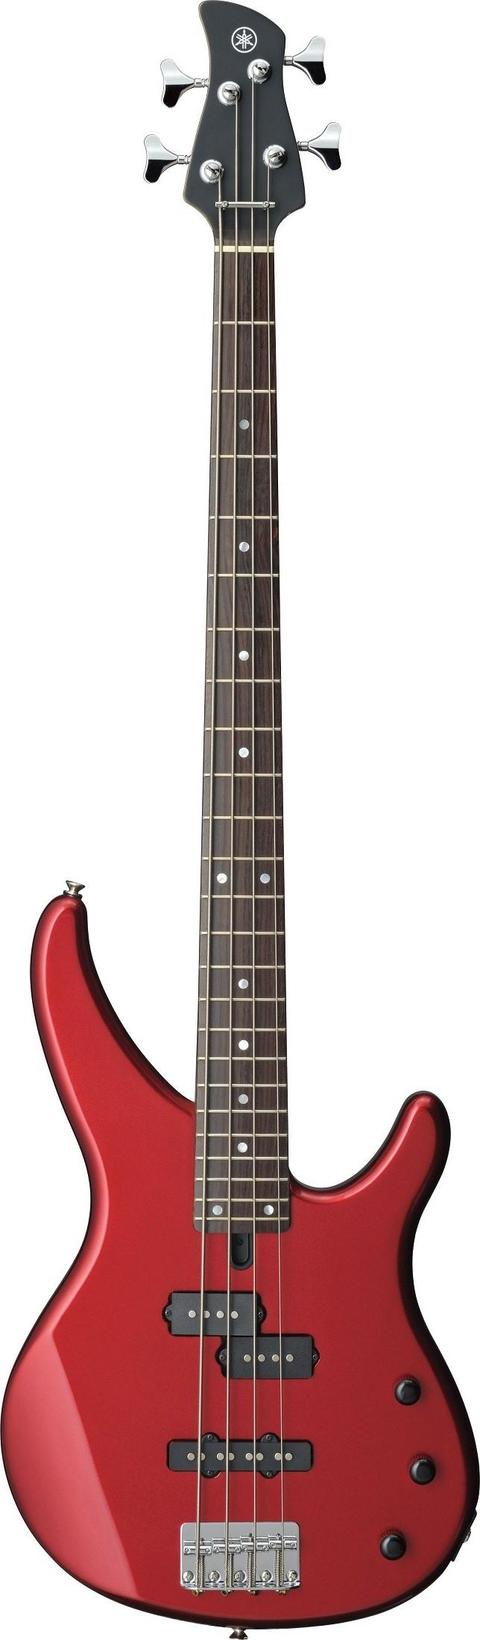 YAMAHA TRBX174 RM RED METALLIC